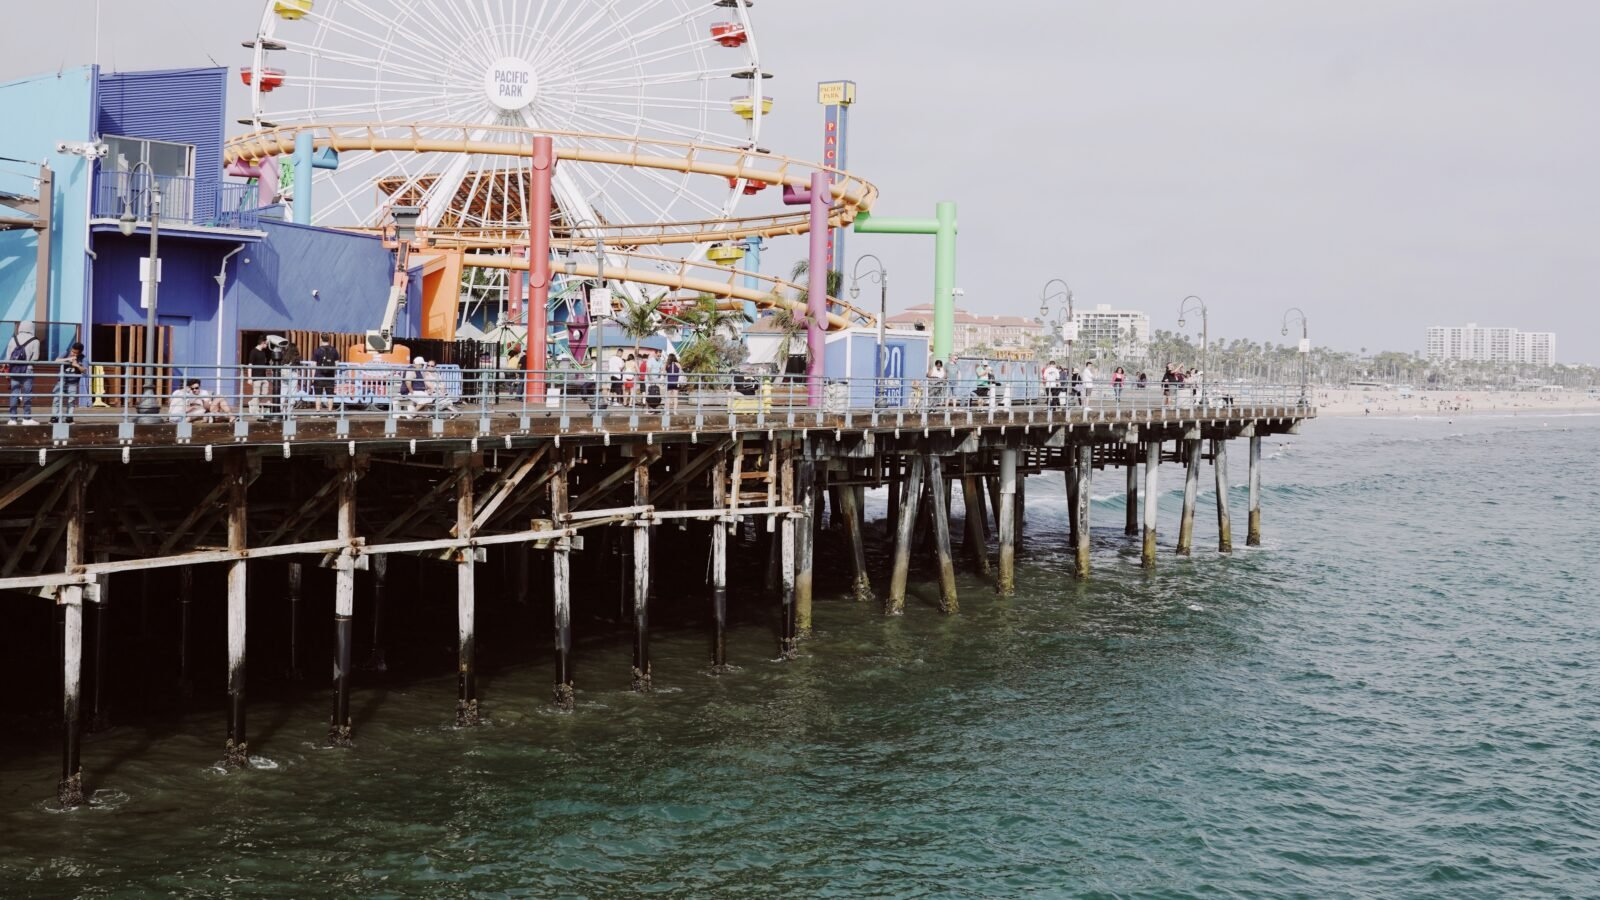 View of ocean and Santa Monica pier